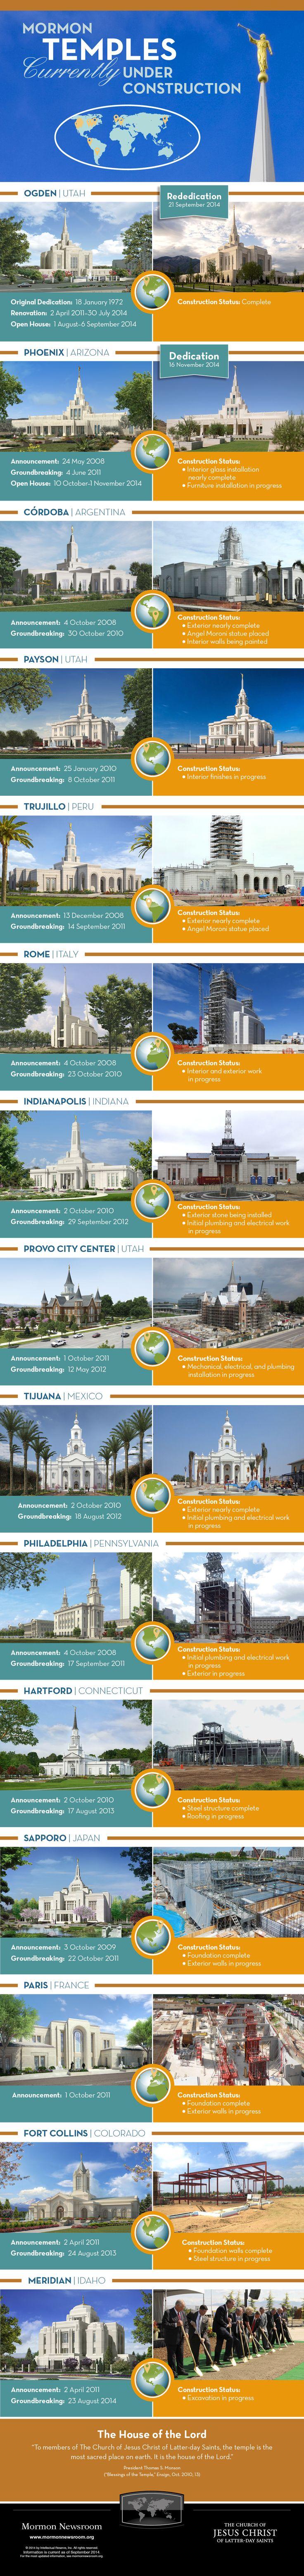 15 Temples Under Construction {Image via Mormon News Room}